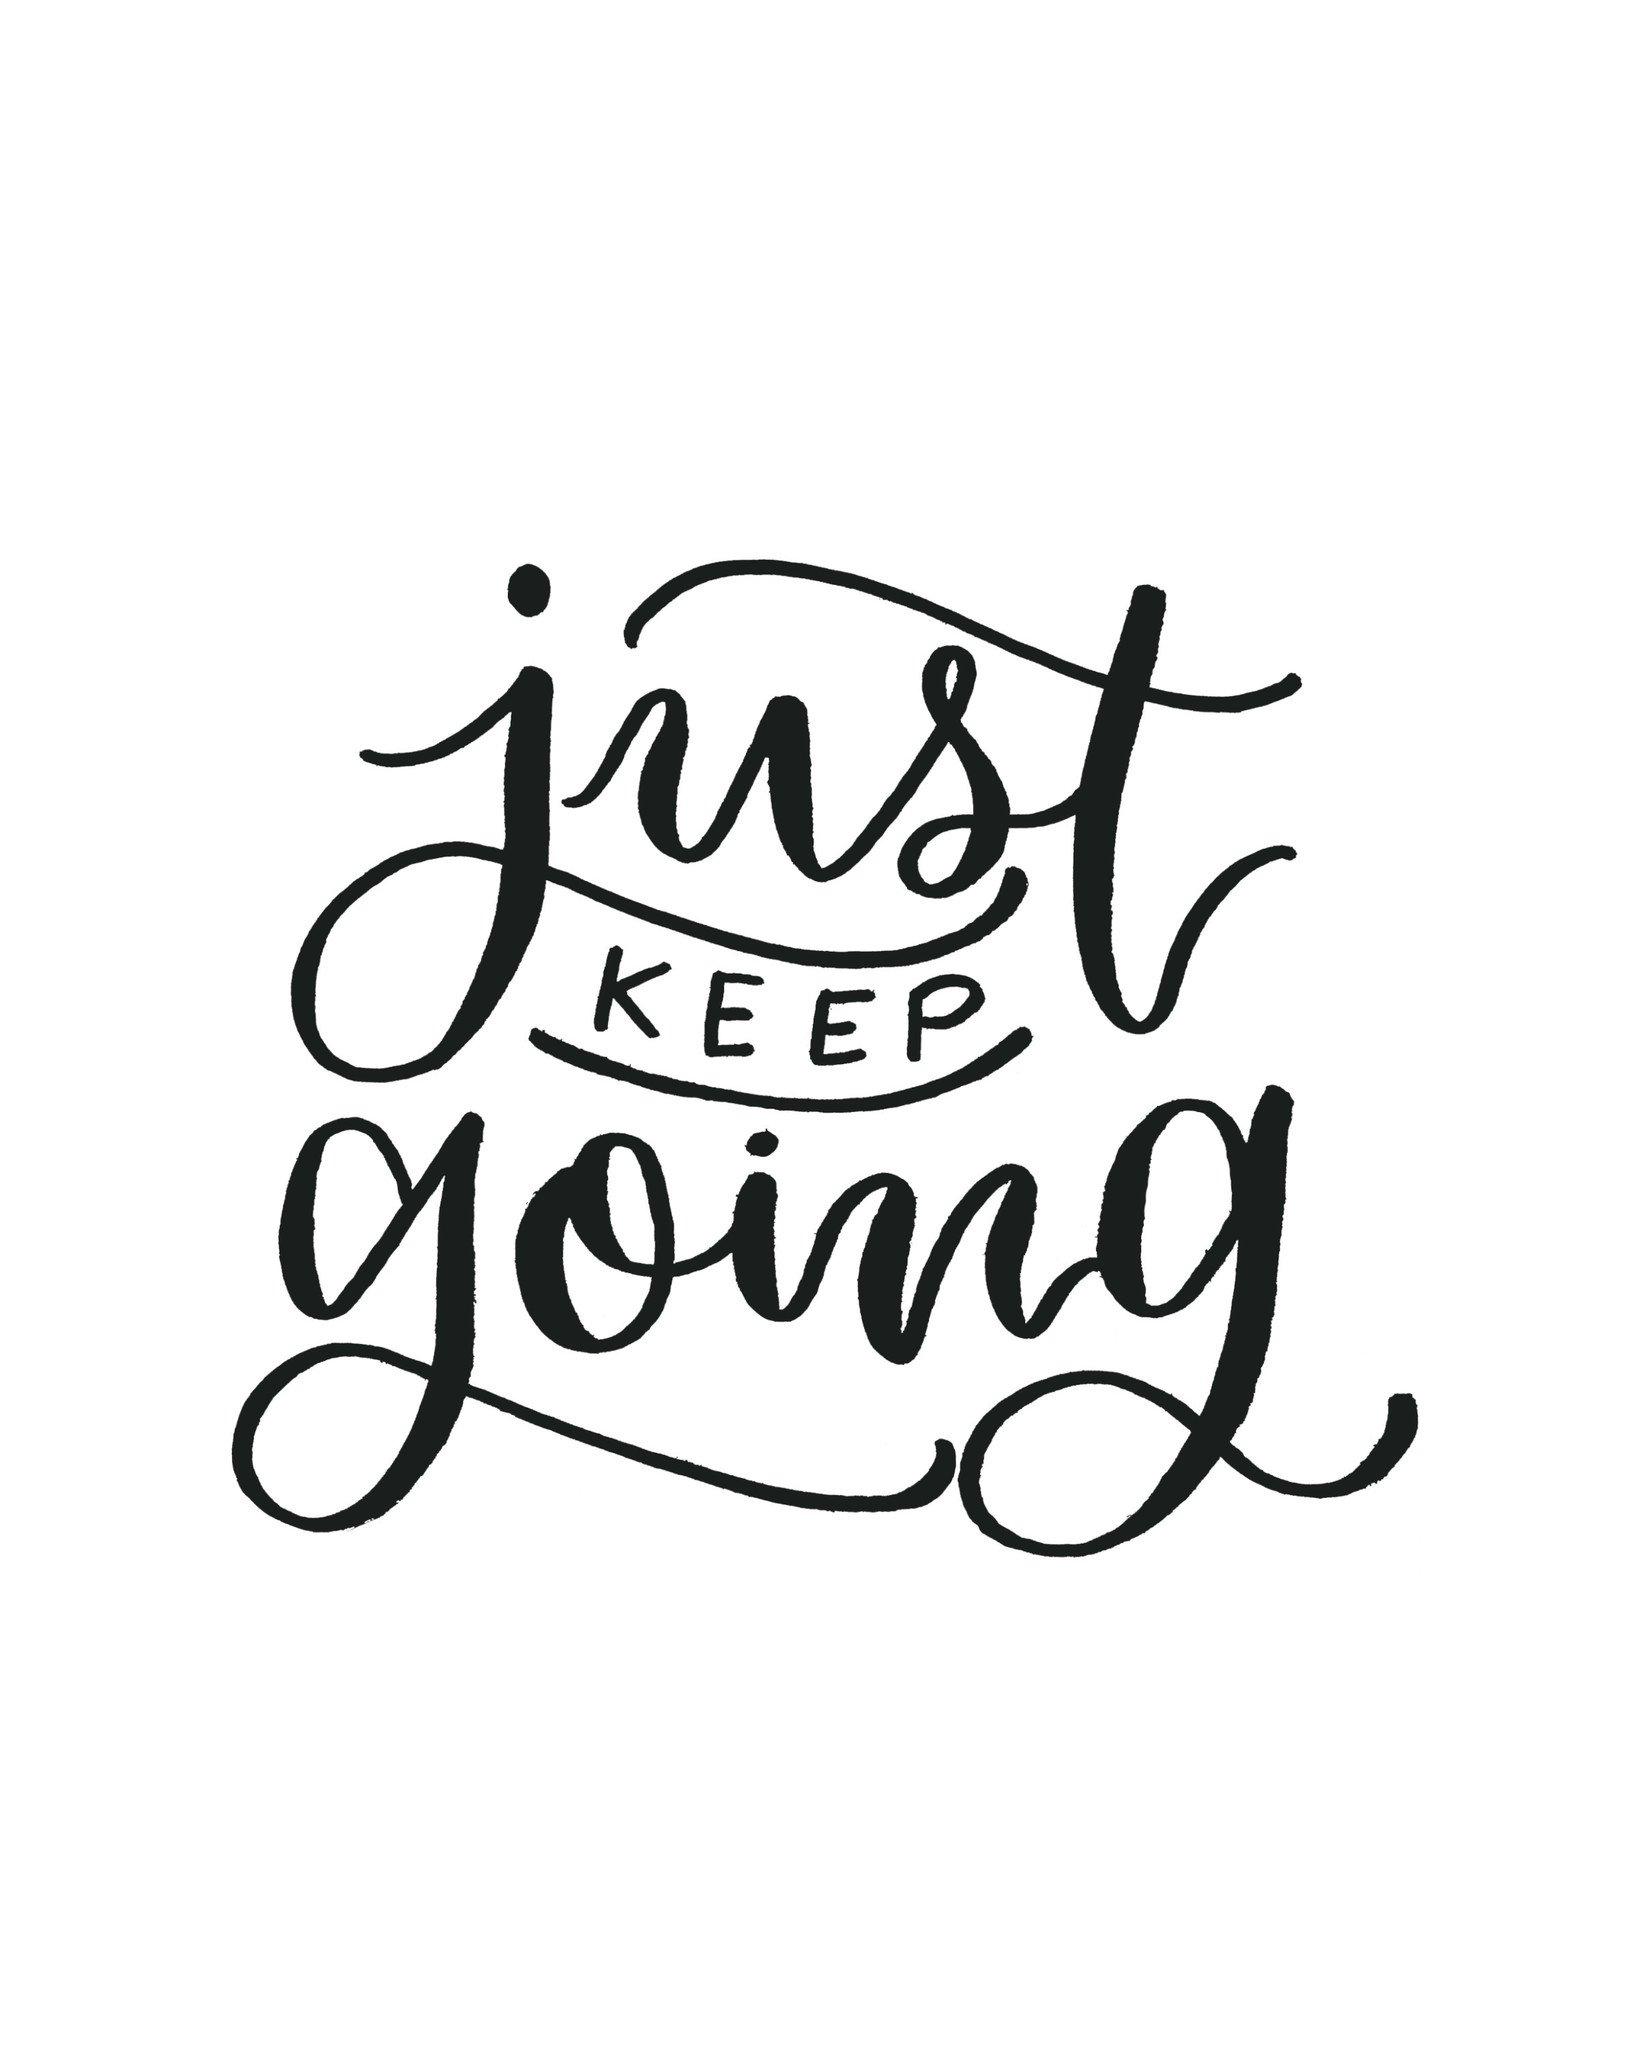 Just_Keep_Going_Printable_White.jpg